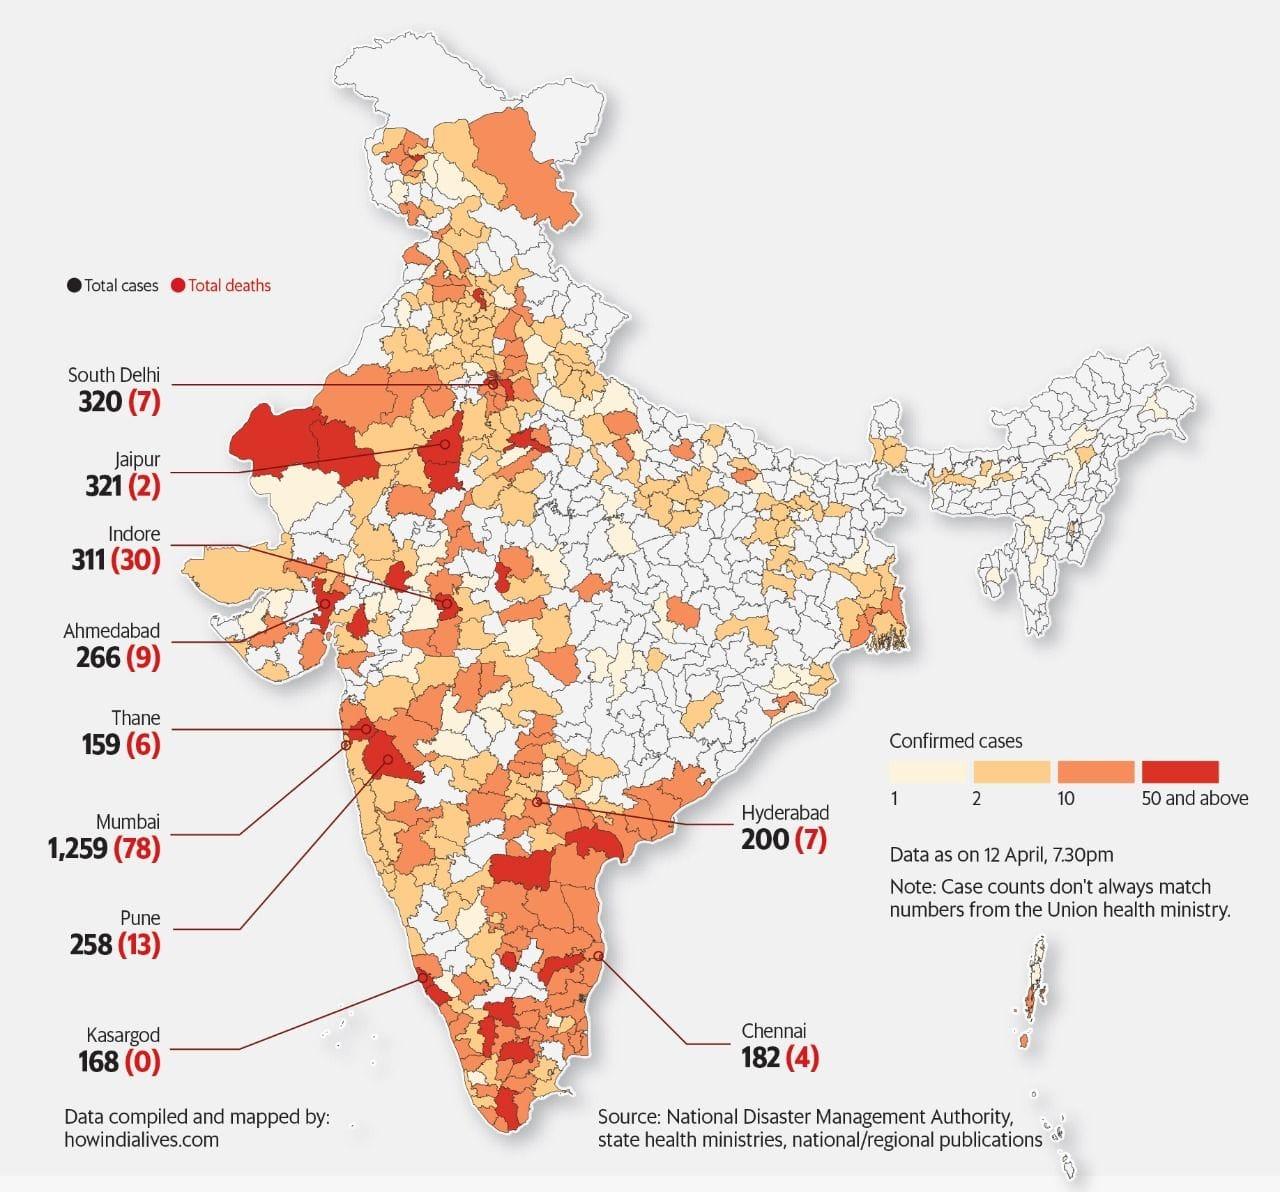 The pandemic footprint.